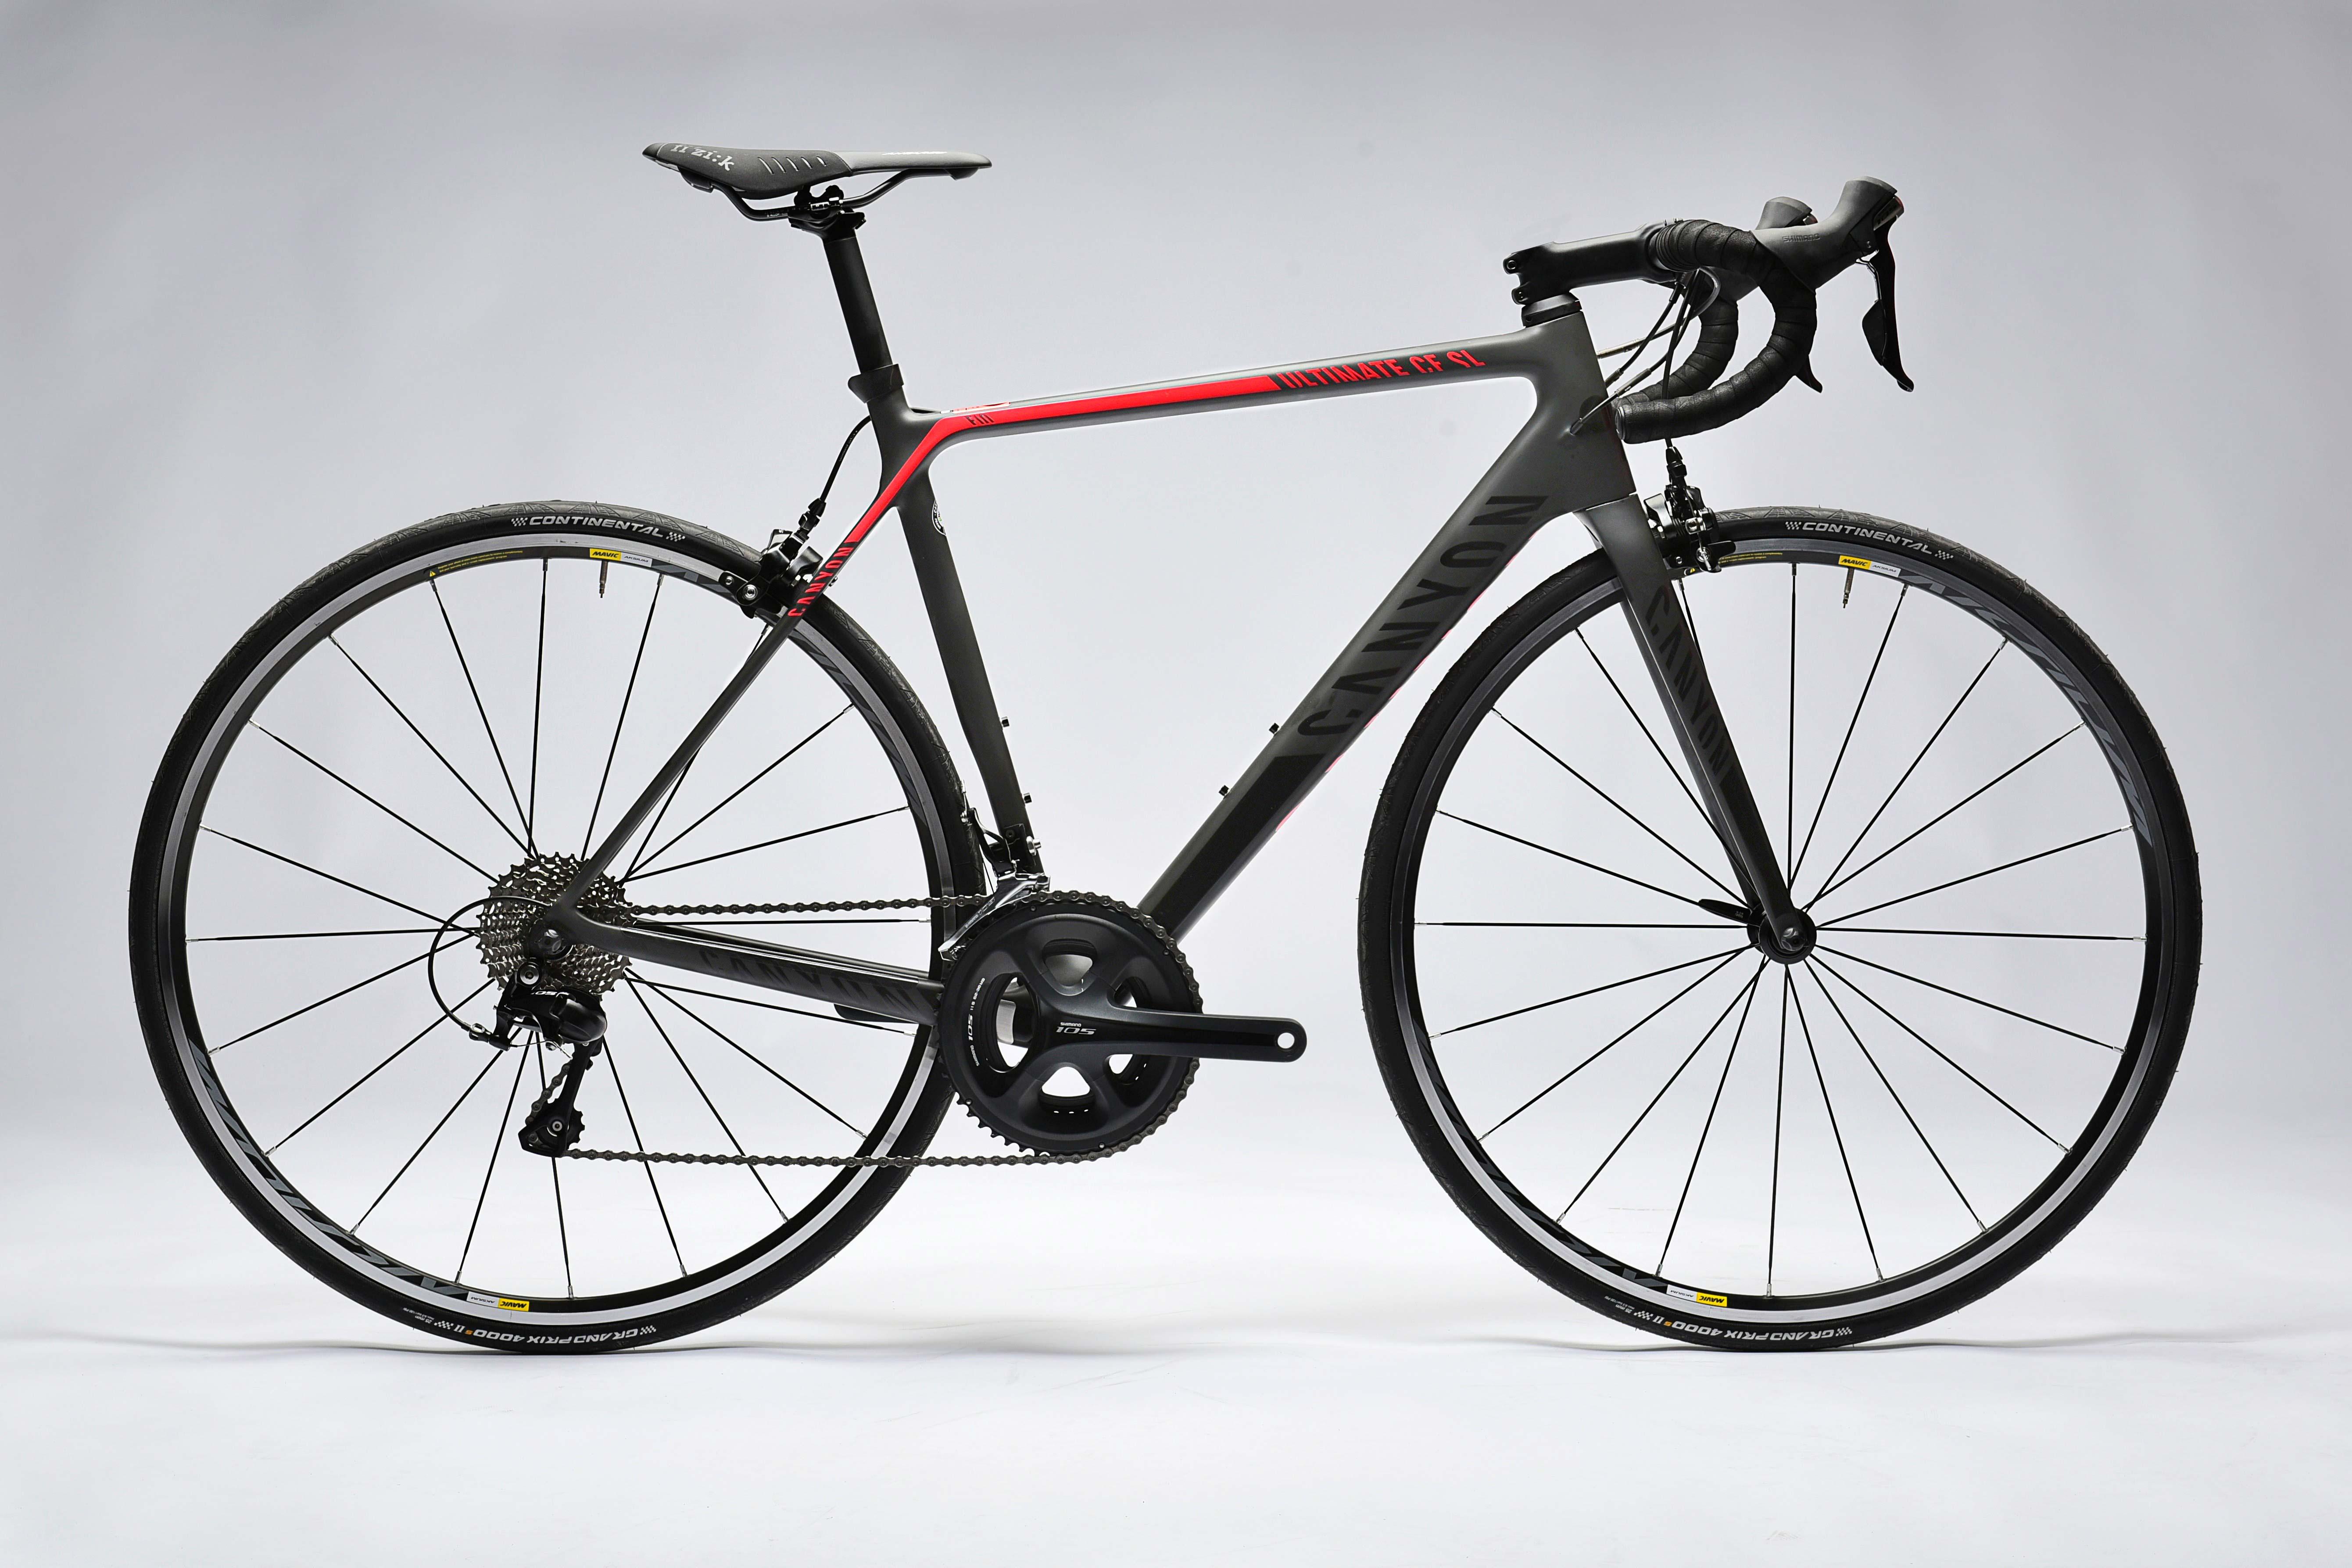 Test-Rennrad-1500-Euro-Räder-Canyon-Ultimate-CF-SL-7